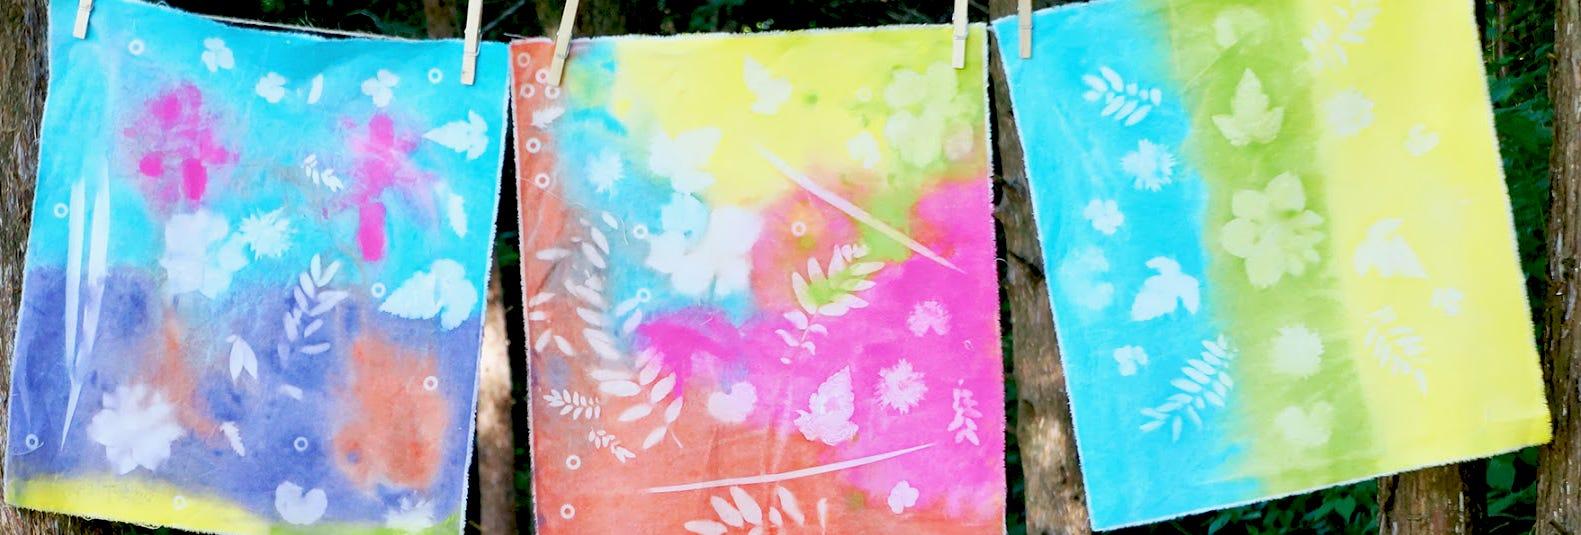 Textilfärger